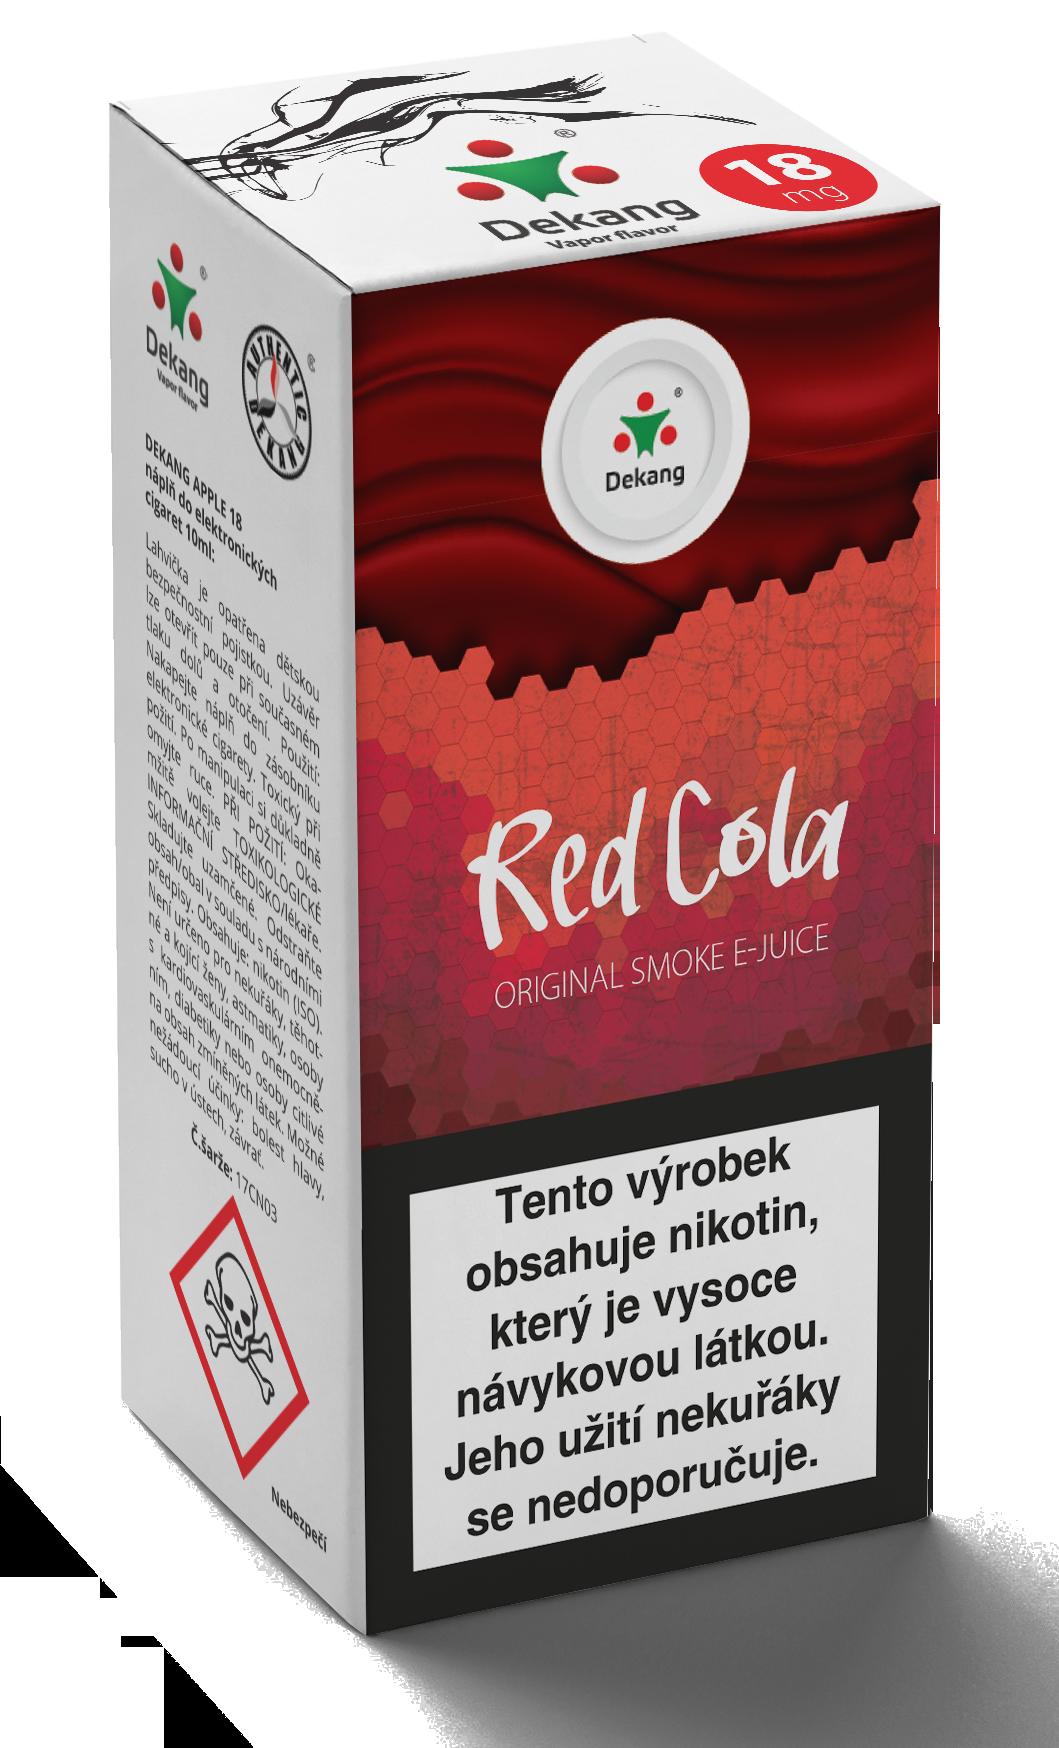 E-liquid Dekang 10ml Red Cola - Kola Množství nikotinu: 11mg